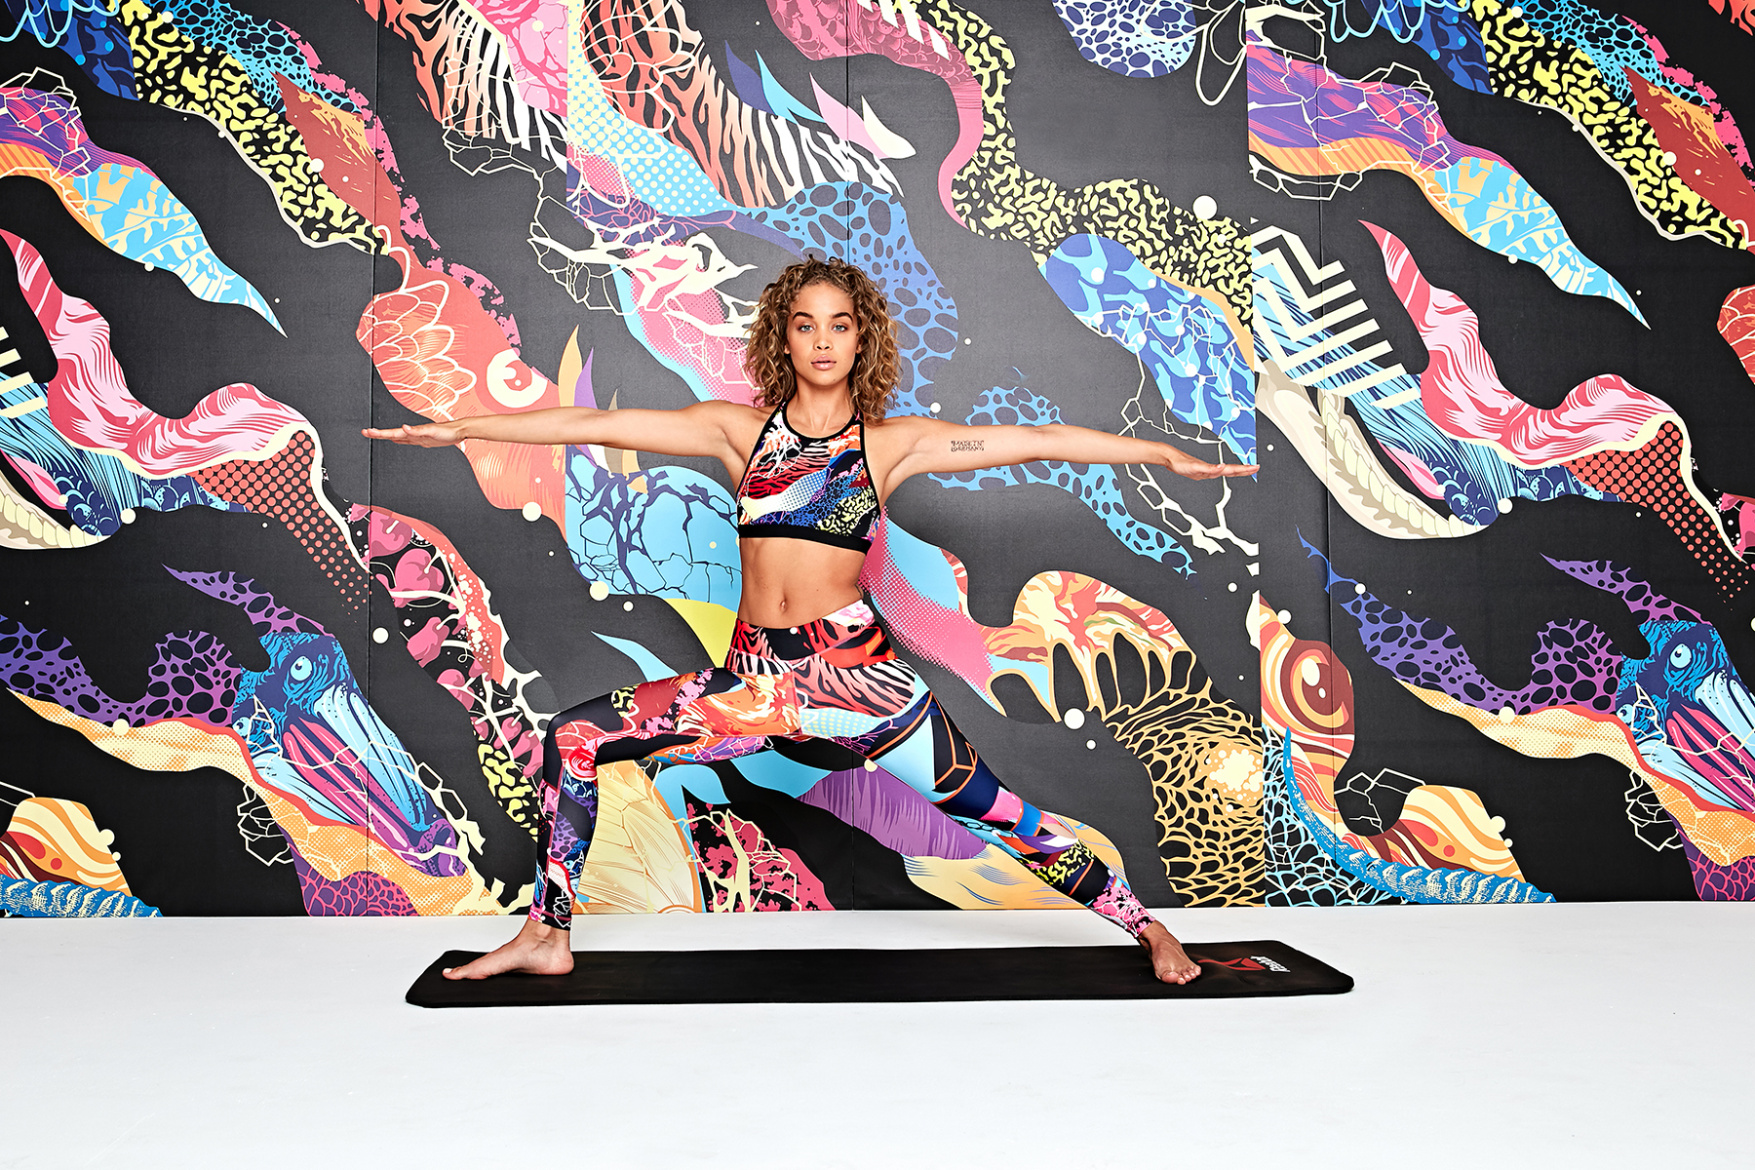 reebok-tristan-eaton-graffiti-yoga-collection-6.jpg